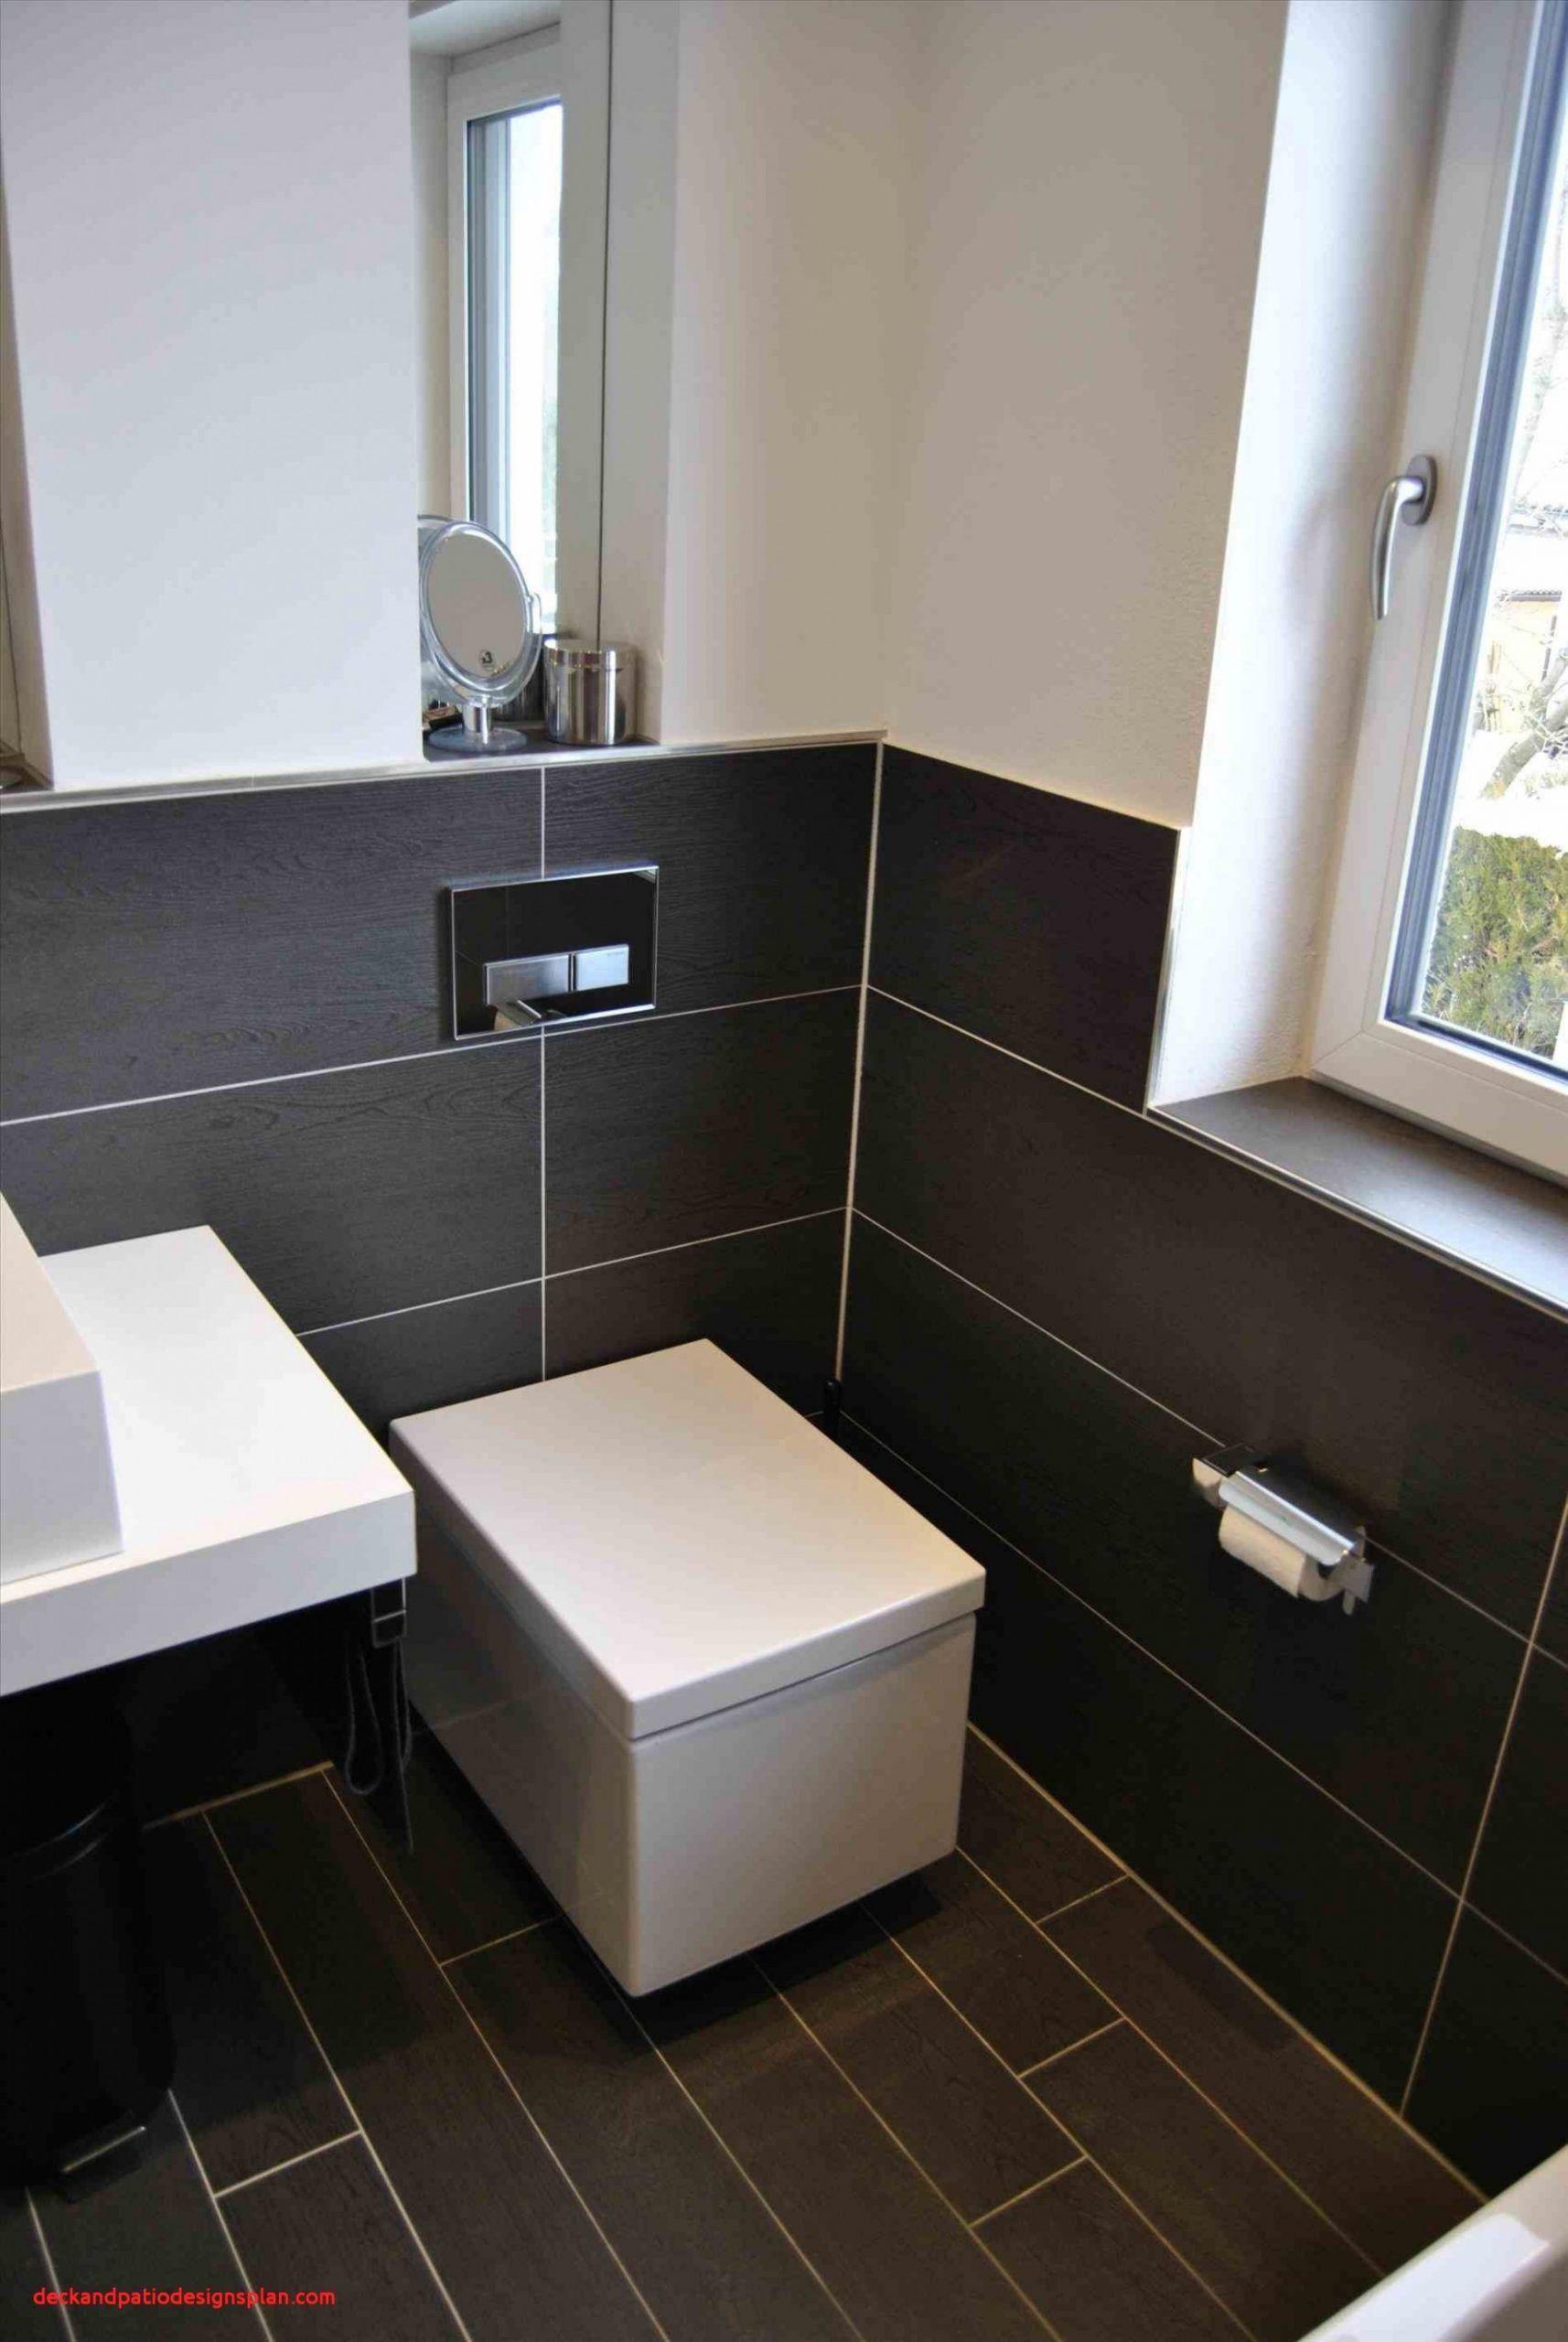 10 Beschwerden Umbauen Ideen In 2020 Badezimmer Fliesen Neues Badezimmer Badezimmerboden